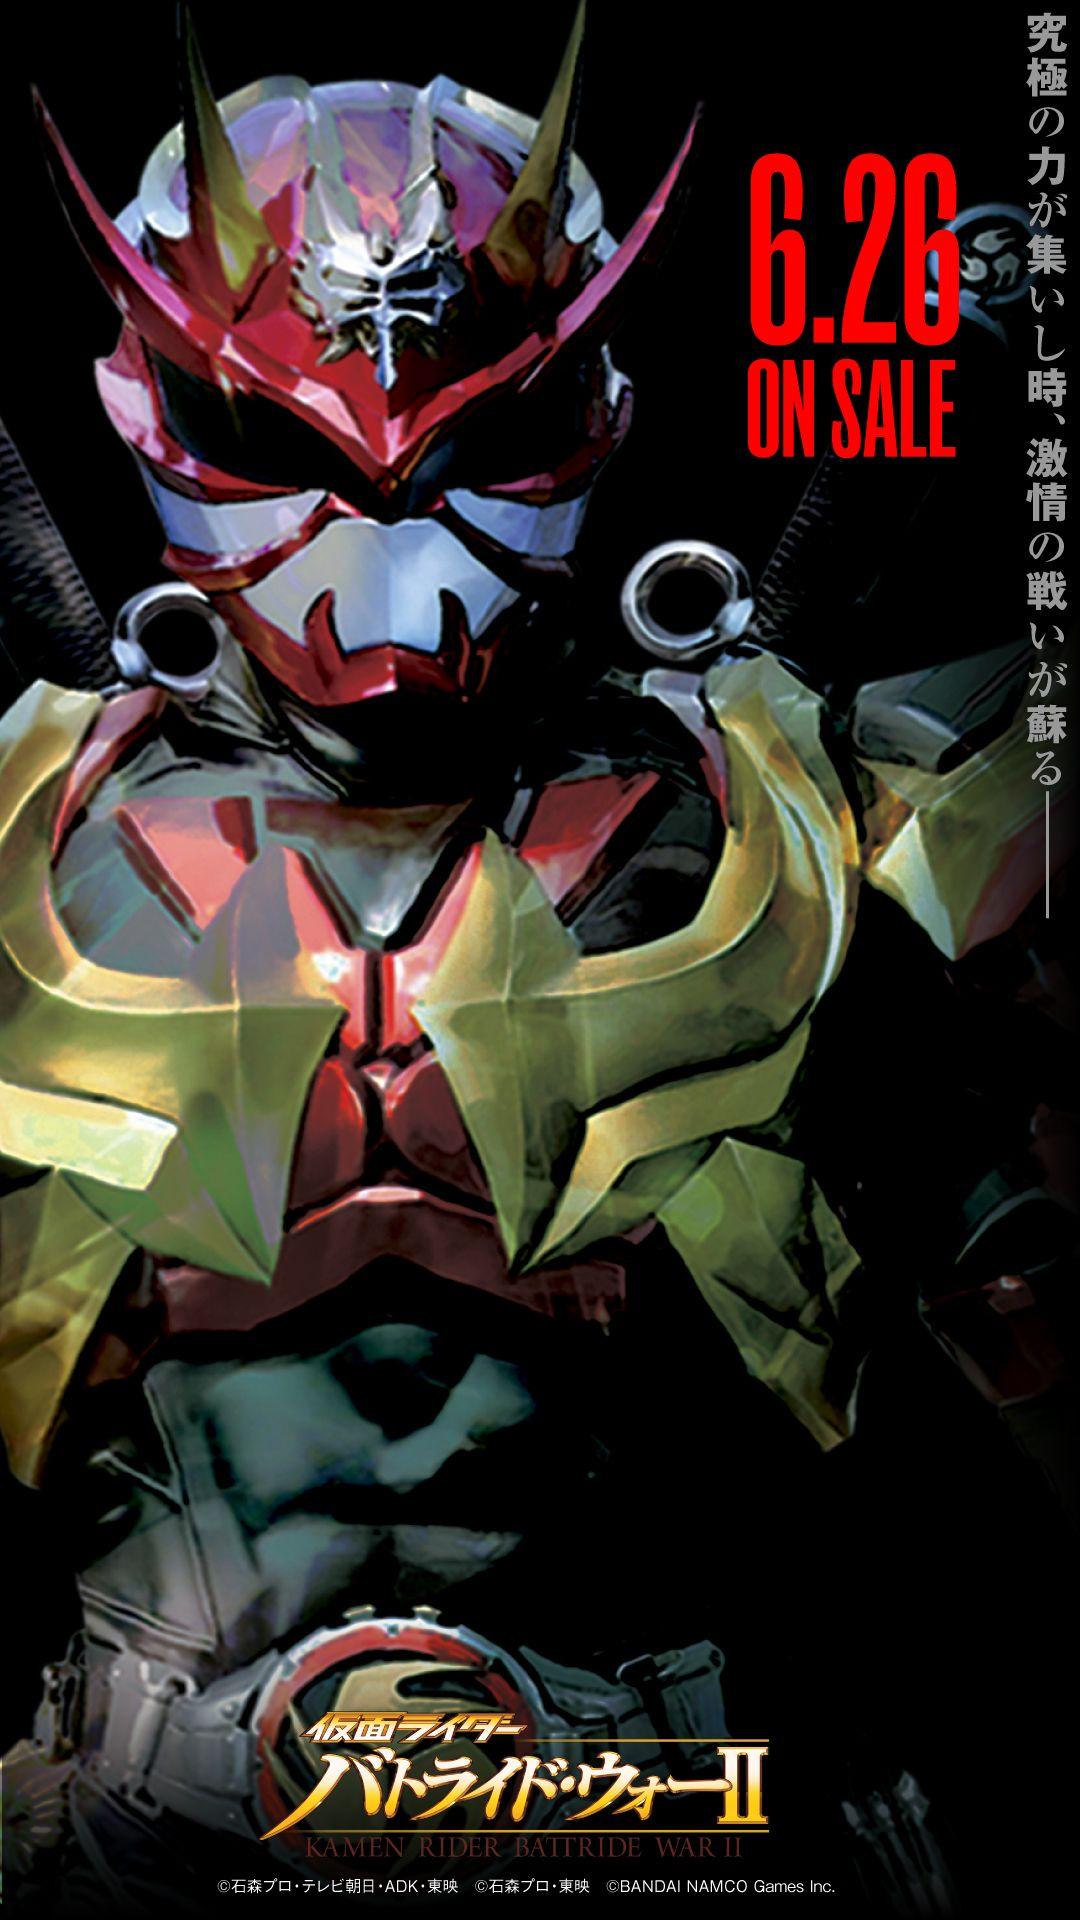 Masked Rider Armed Hibiki Kamenrider Maskedrider 仮面ライダー